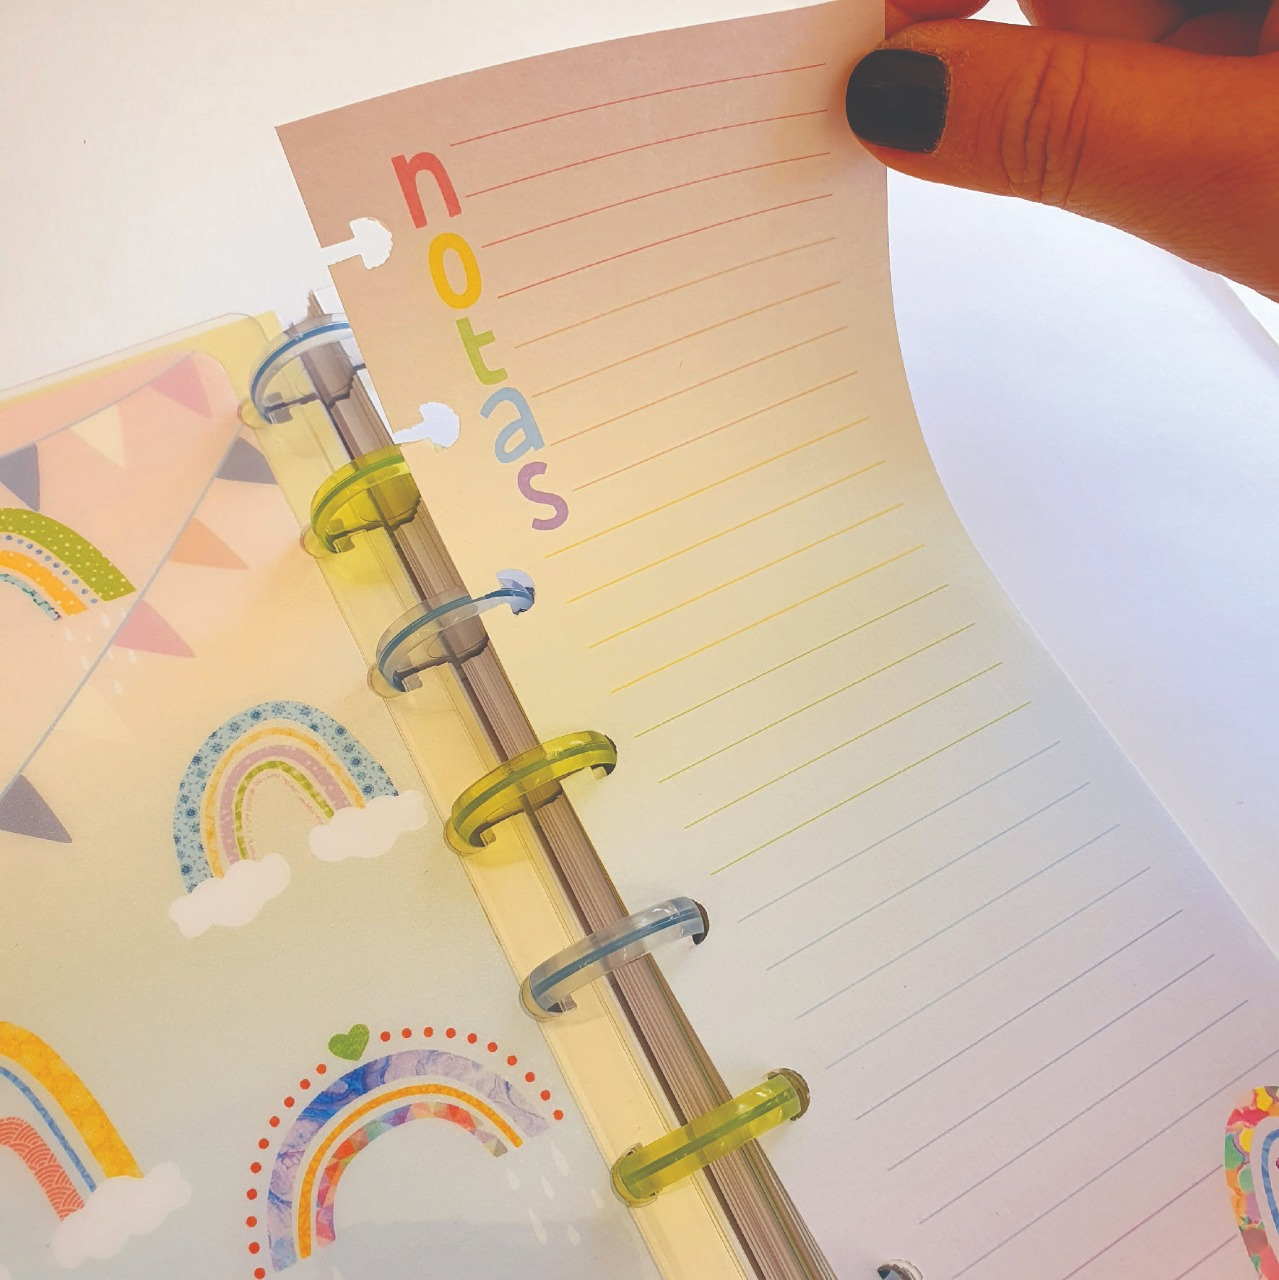 Refil Caderno de Disco - OCTO - Notas Arco-Íris